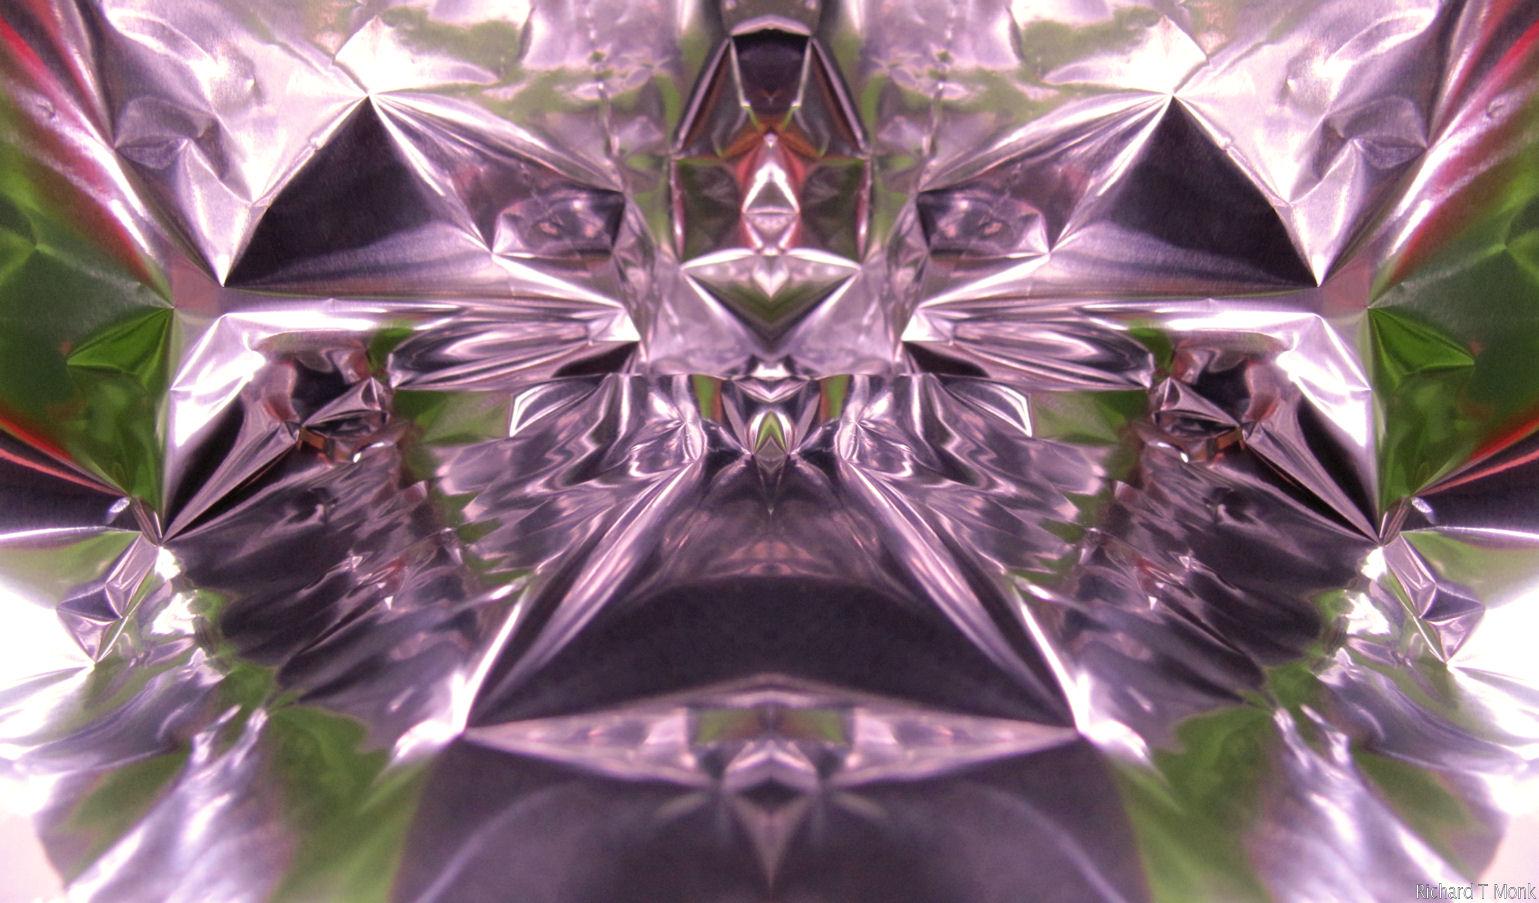 Mirror Image Art: Psychic Block